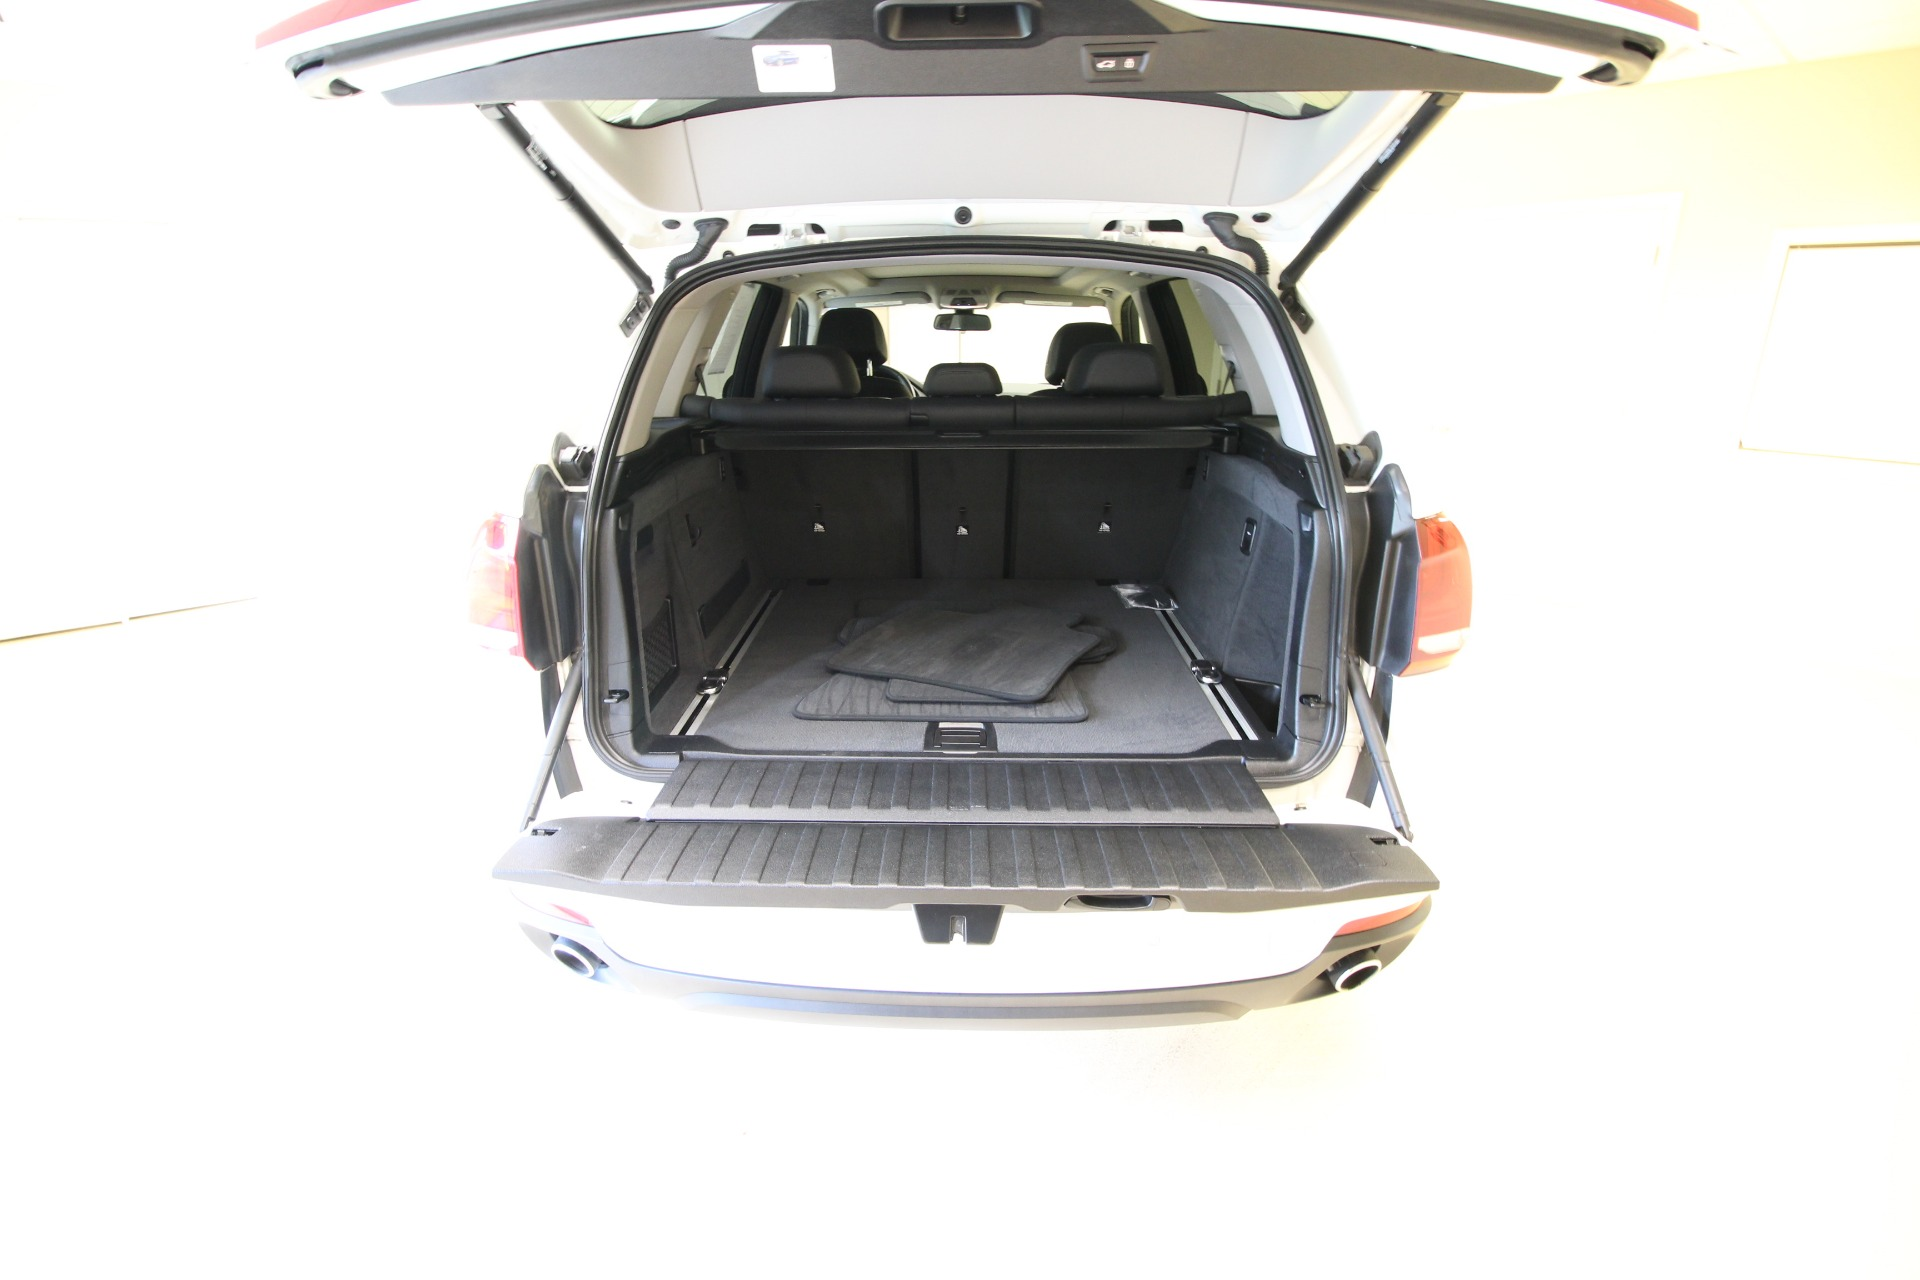 Used 2016 BMW X5 xDrive35i LOADED WITH OPTIONS | Albany, NY